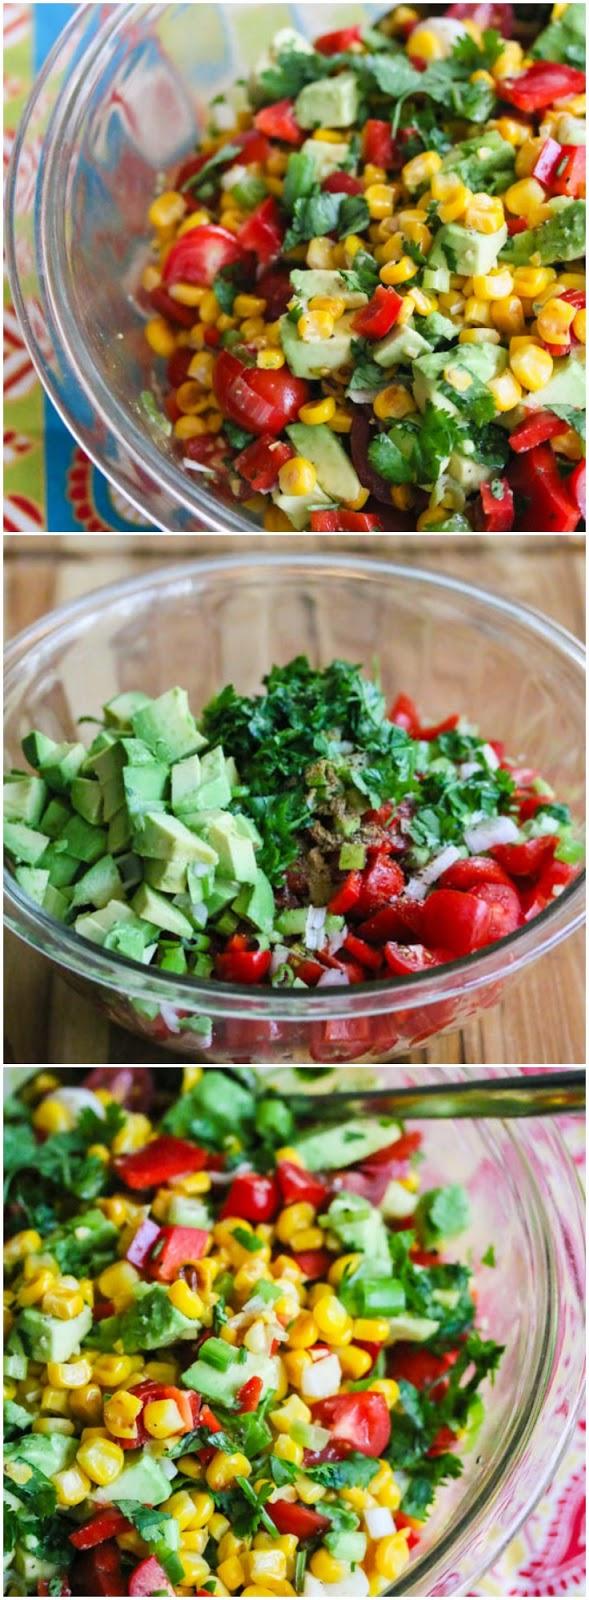 http://jeanetteshealthyliving.com/2014/06/corn-tomato-avocado-salsa-salad.html